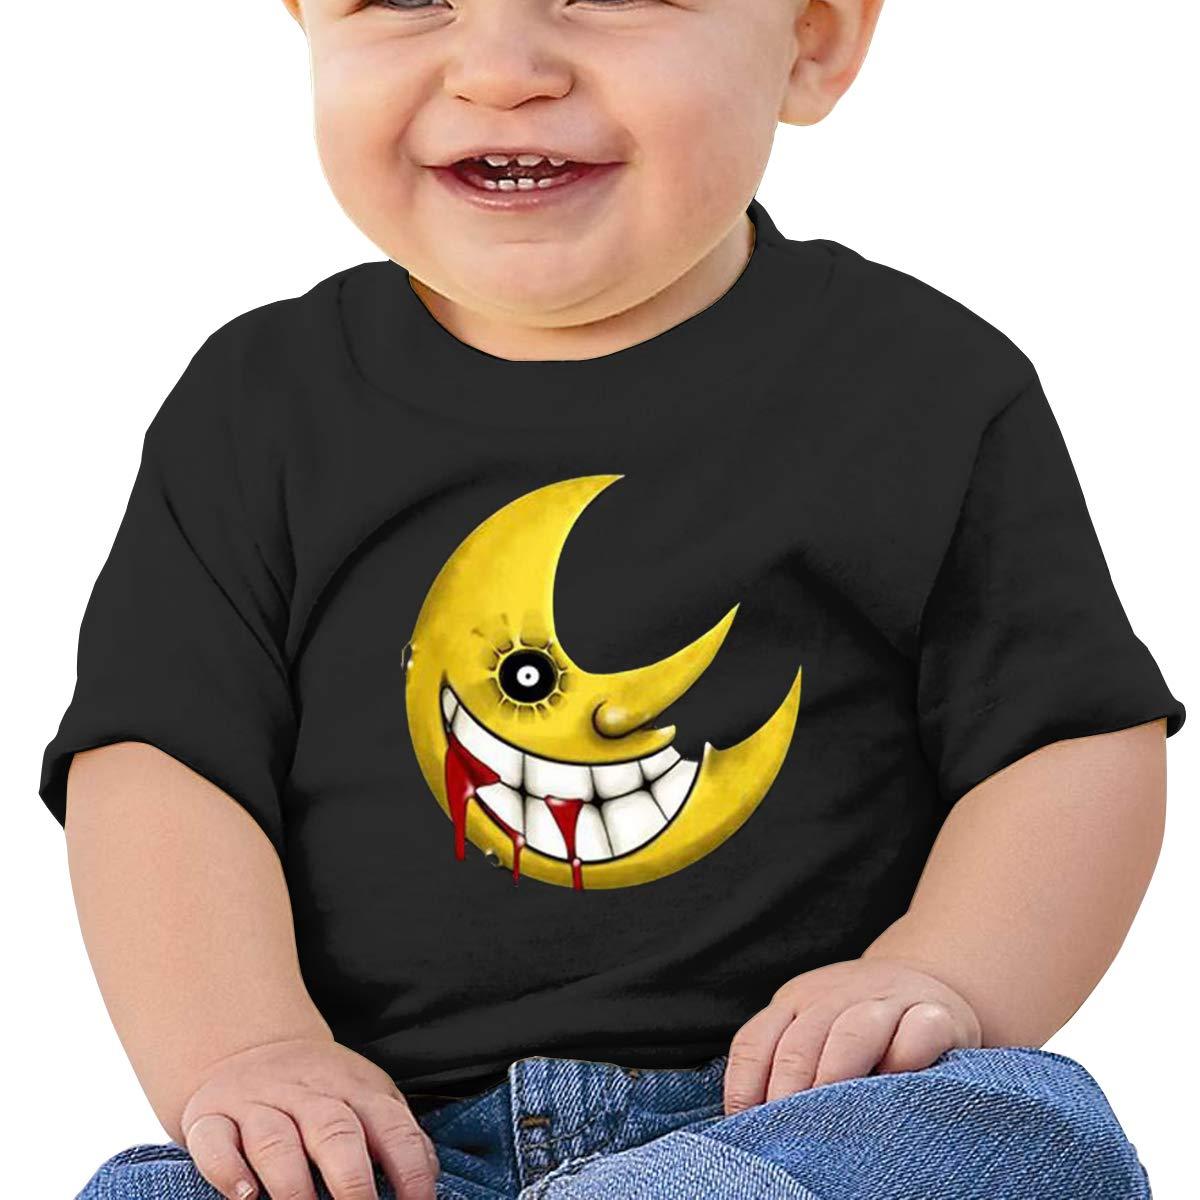 MONIKAL Unisex Infant Short Sleeve T-Shirt Soul-Eater-Moon Toddler Kids Organic Cotton Graphic Tee Tops